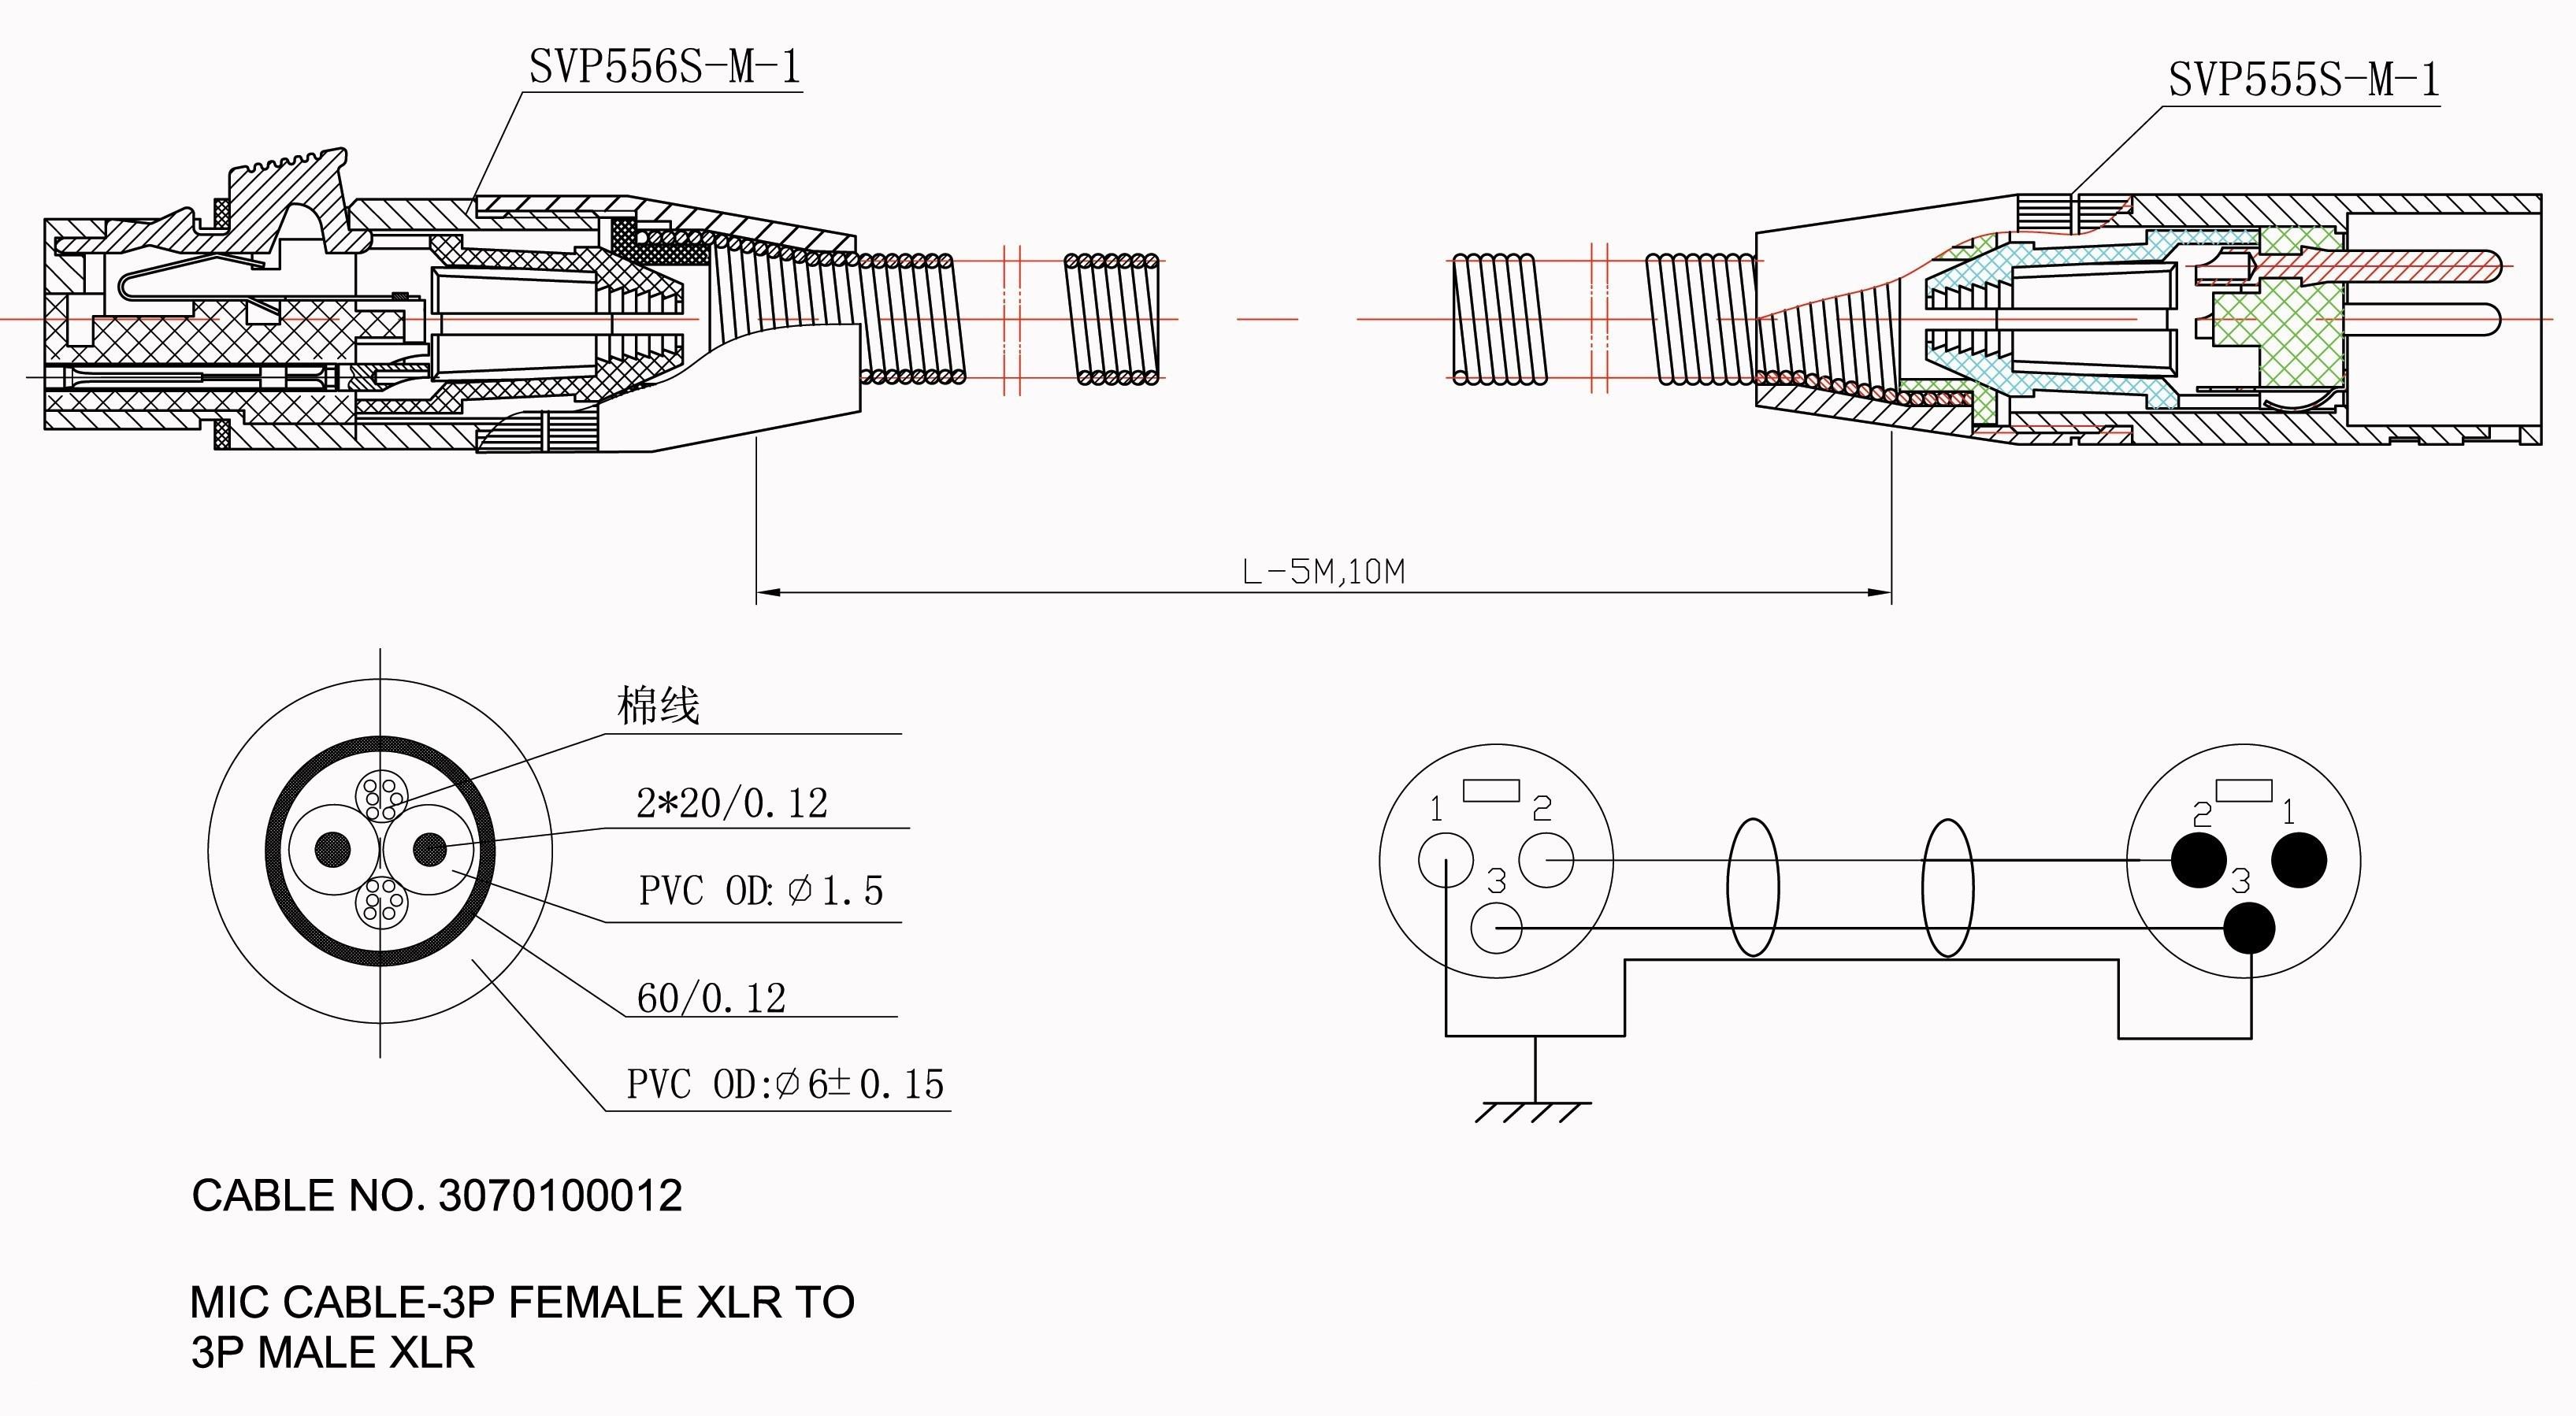 7 3 L Powerstroke Engine Diagram 7 3 Powerstroke Glow Plug Relay Wiring Diagram Simple 7 3 Glow Plug Of 7 3 L Powerstroke Engine Diagram